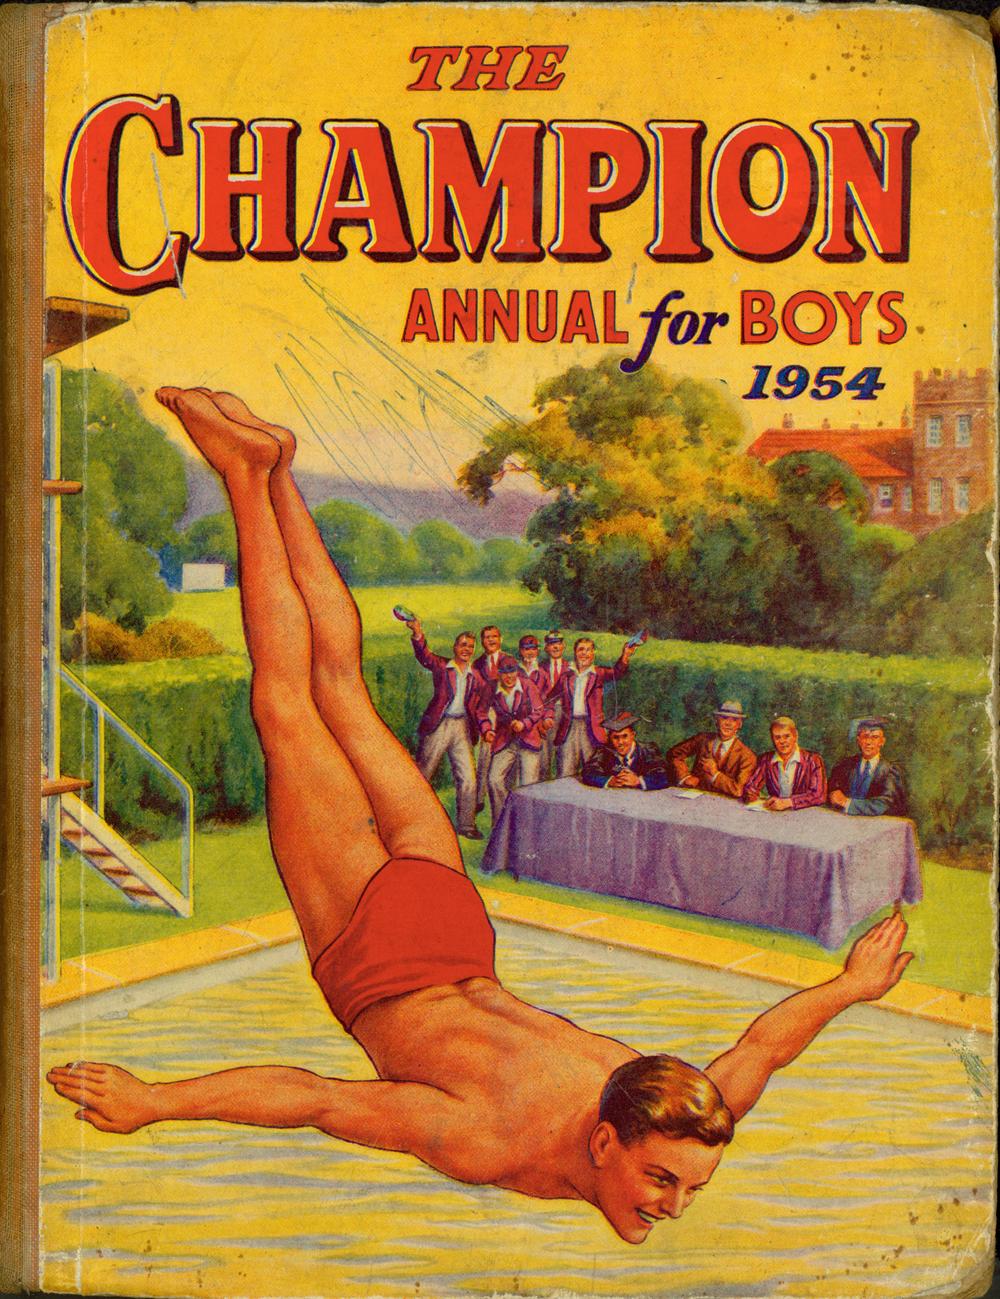 ChampionAnnual.png